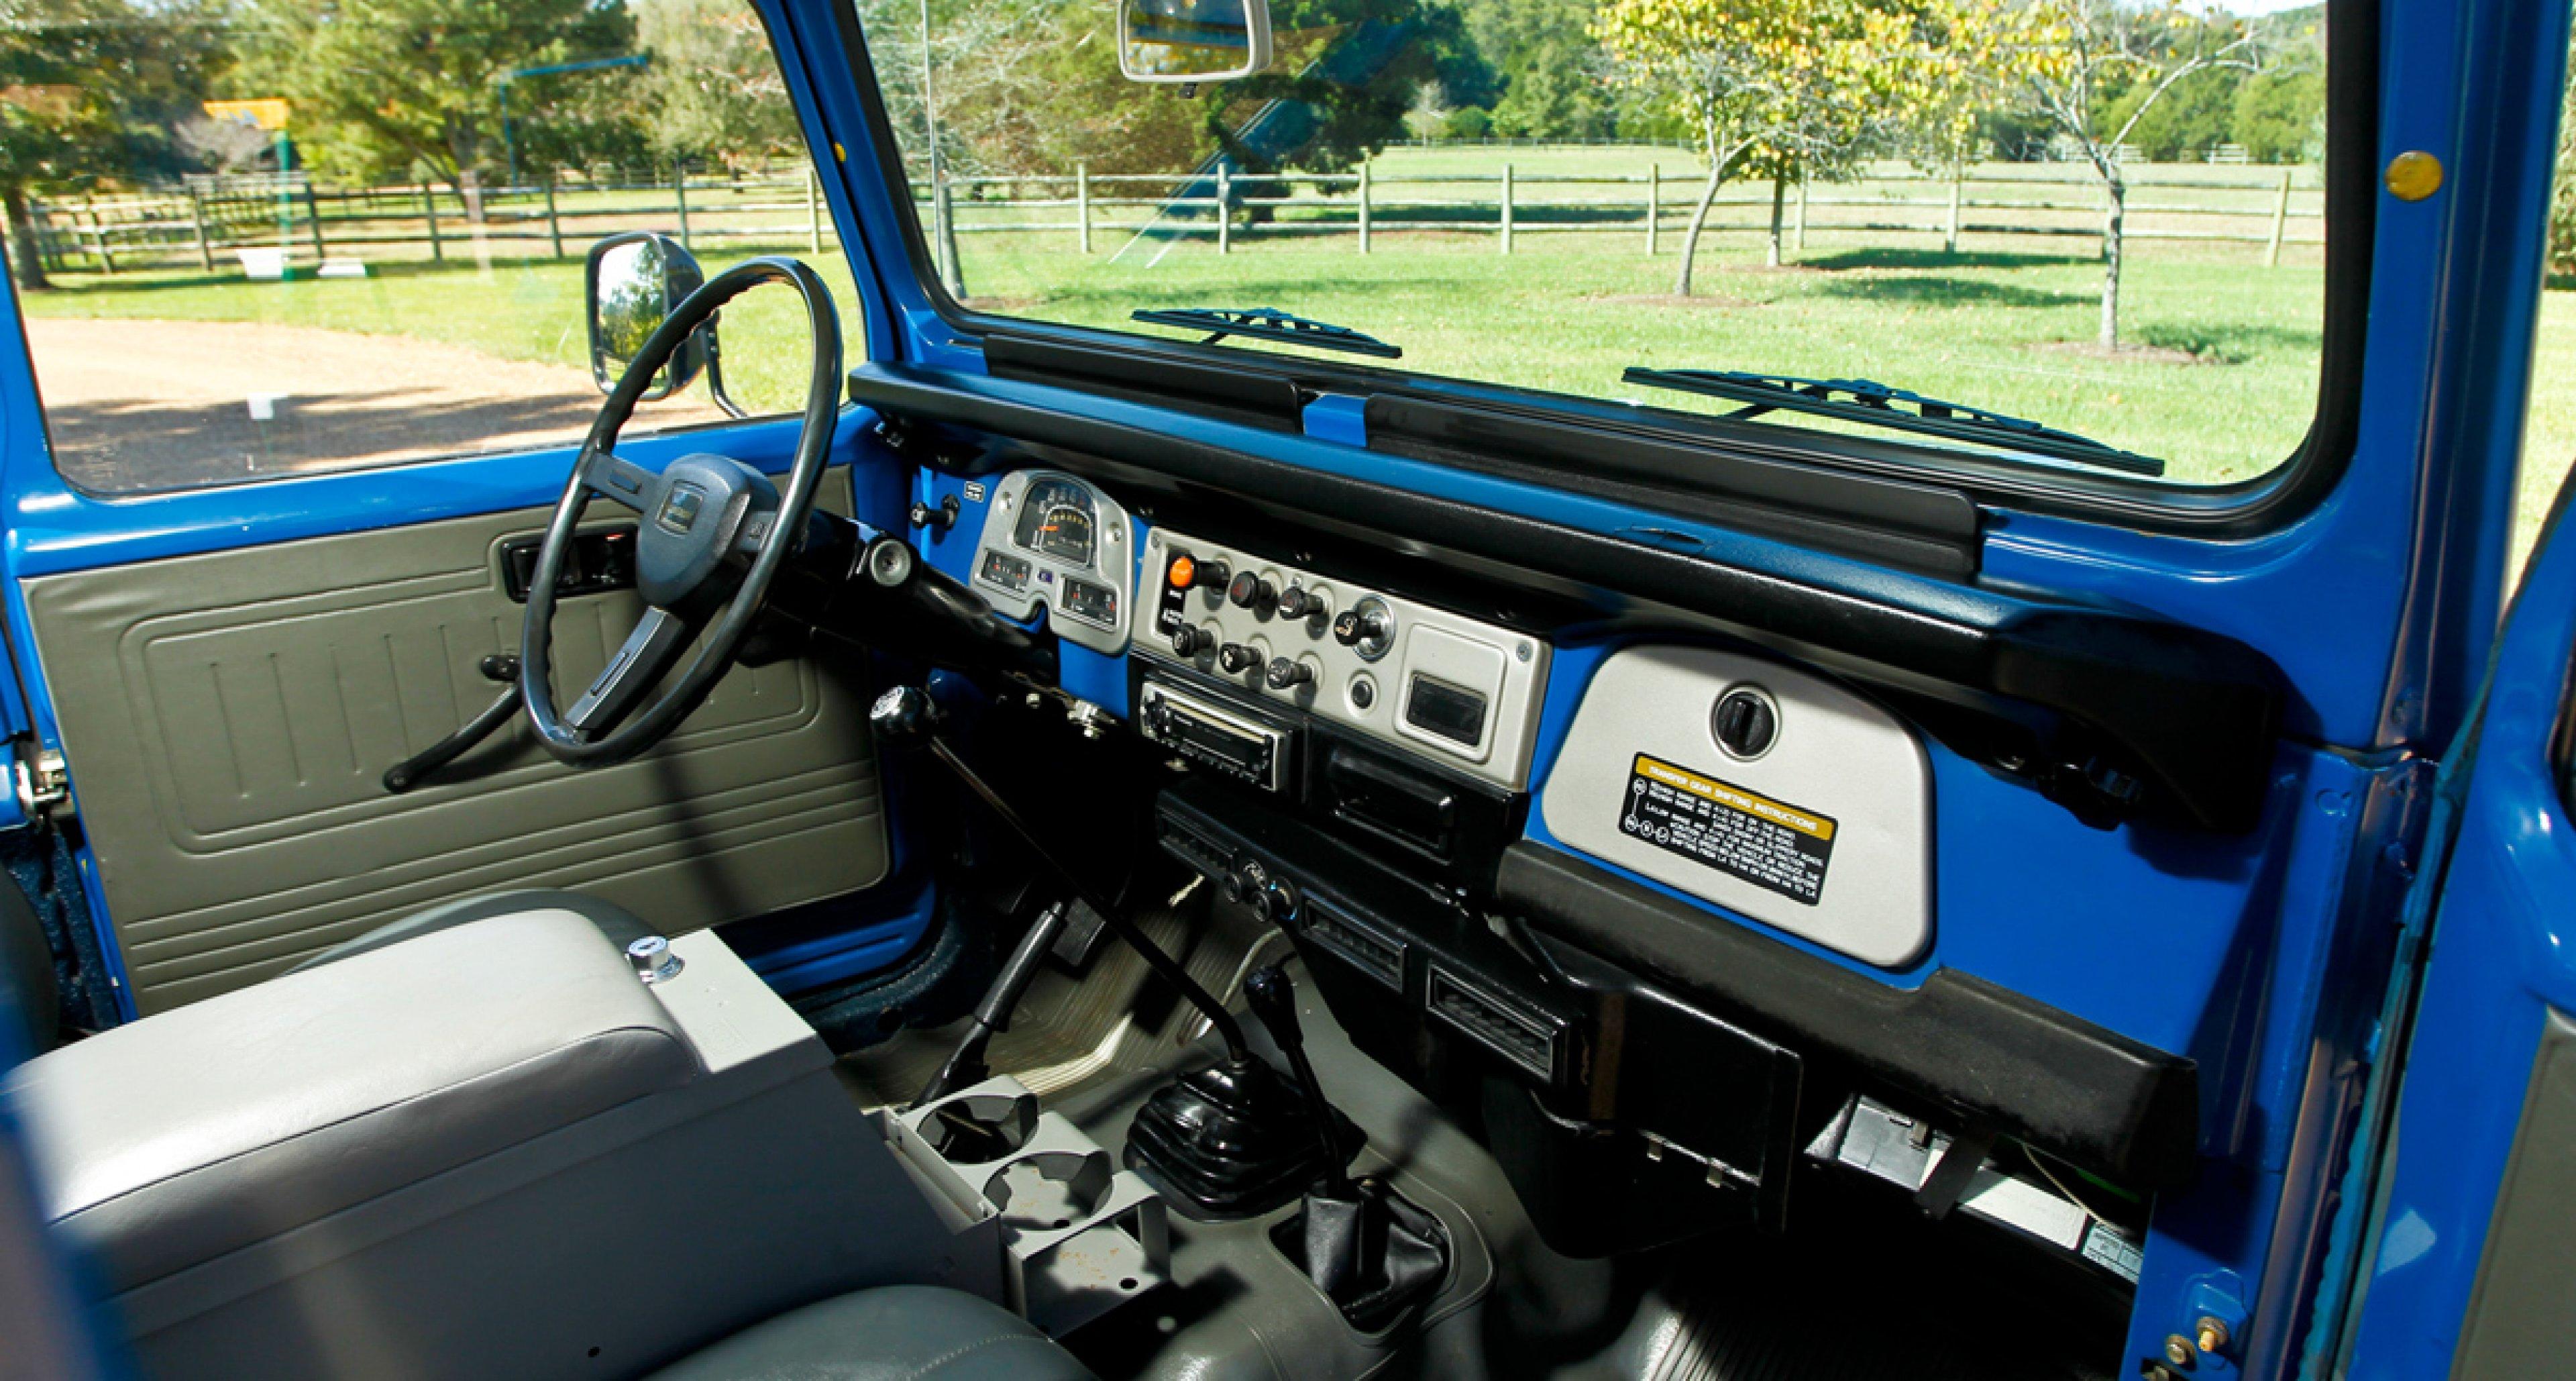 Gooding & Company: 1983 Toyota Land Crusier FJ40 (USD 40.000 - 60.000)